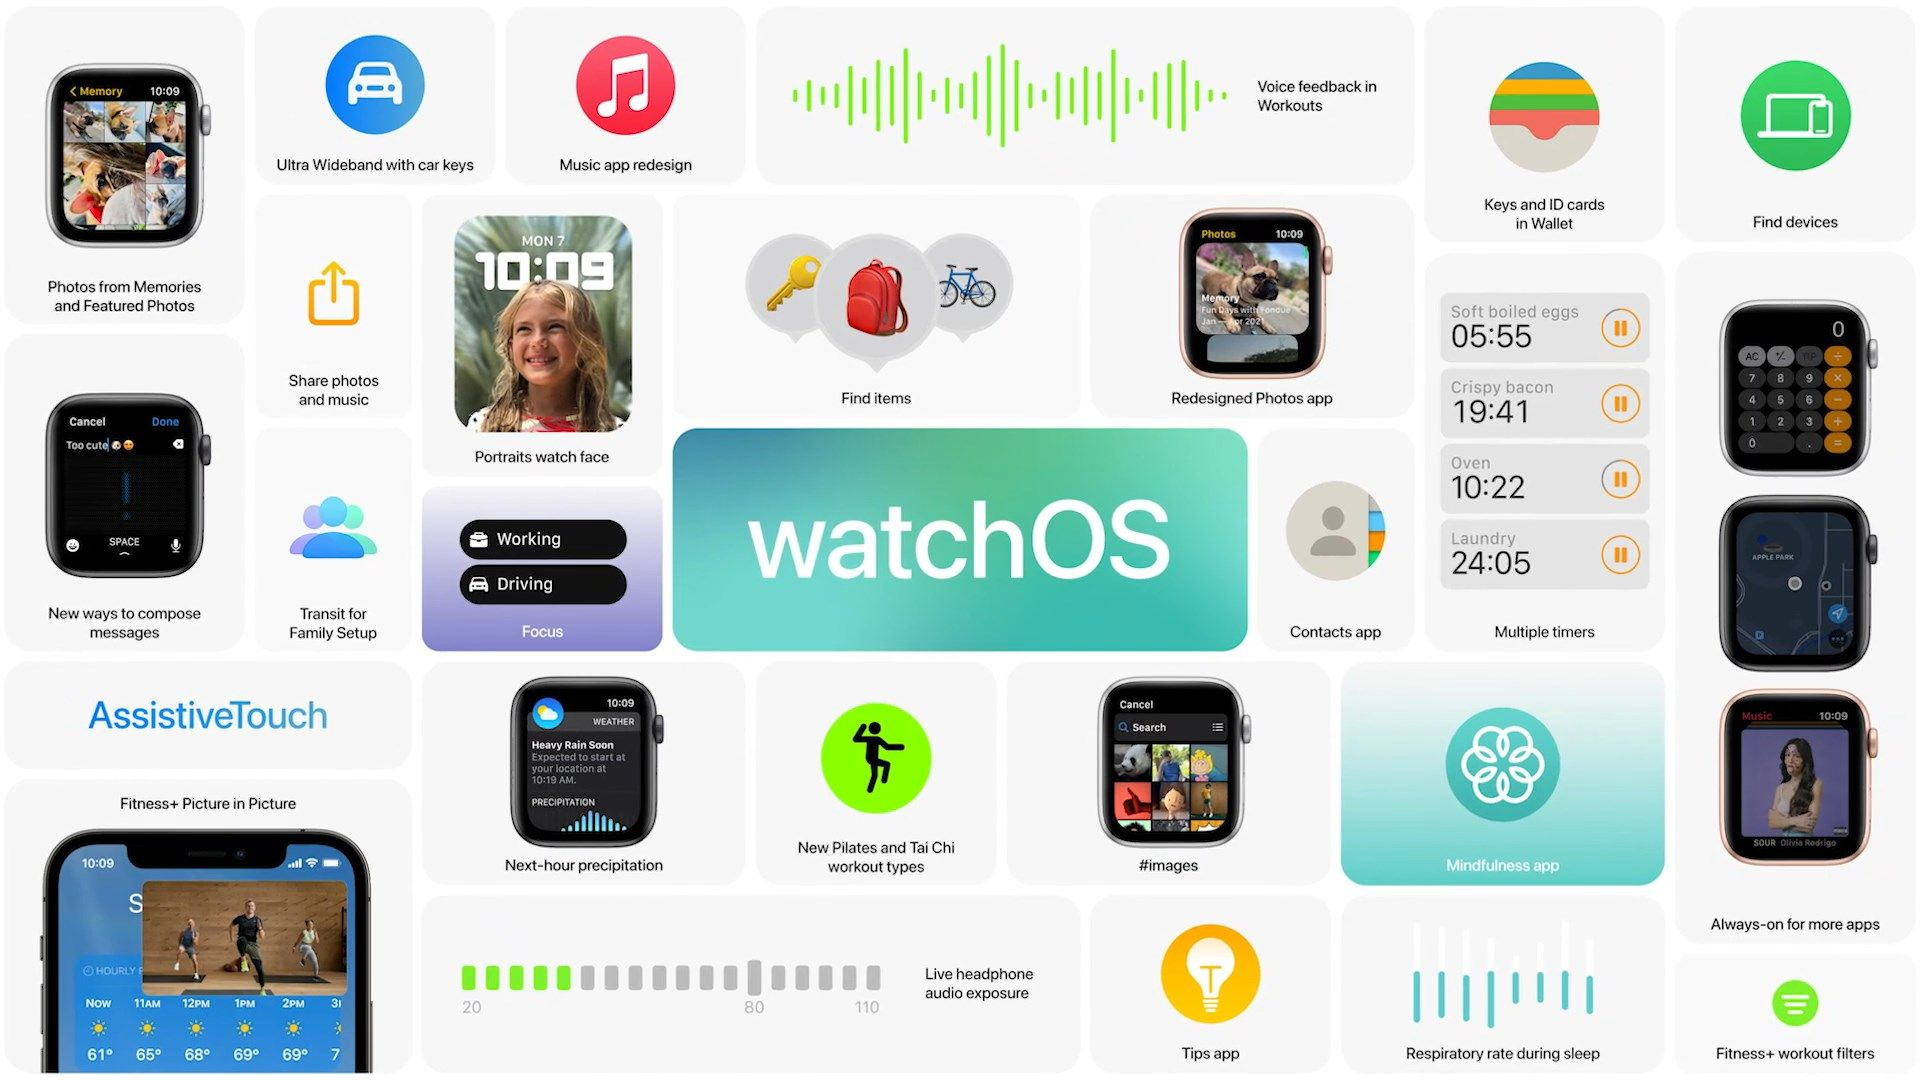 Novinky z Apple WWDC 2021 Keynote obrazom